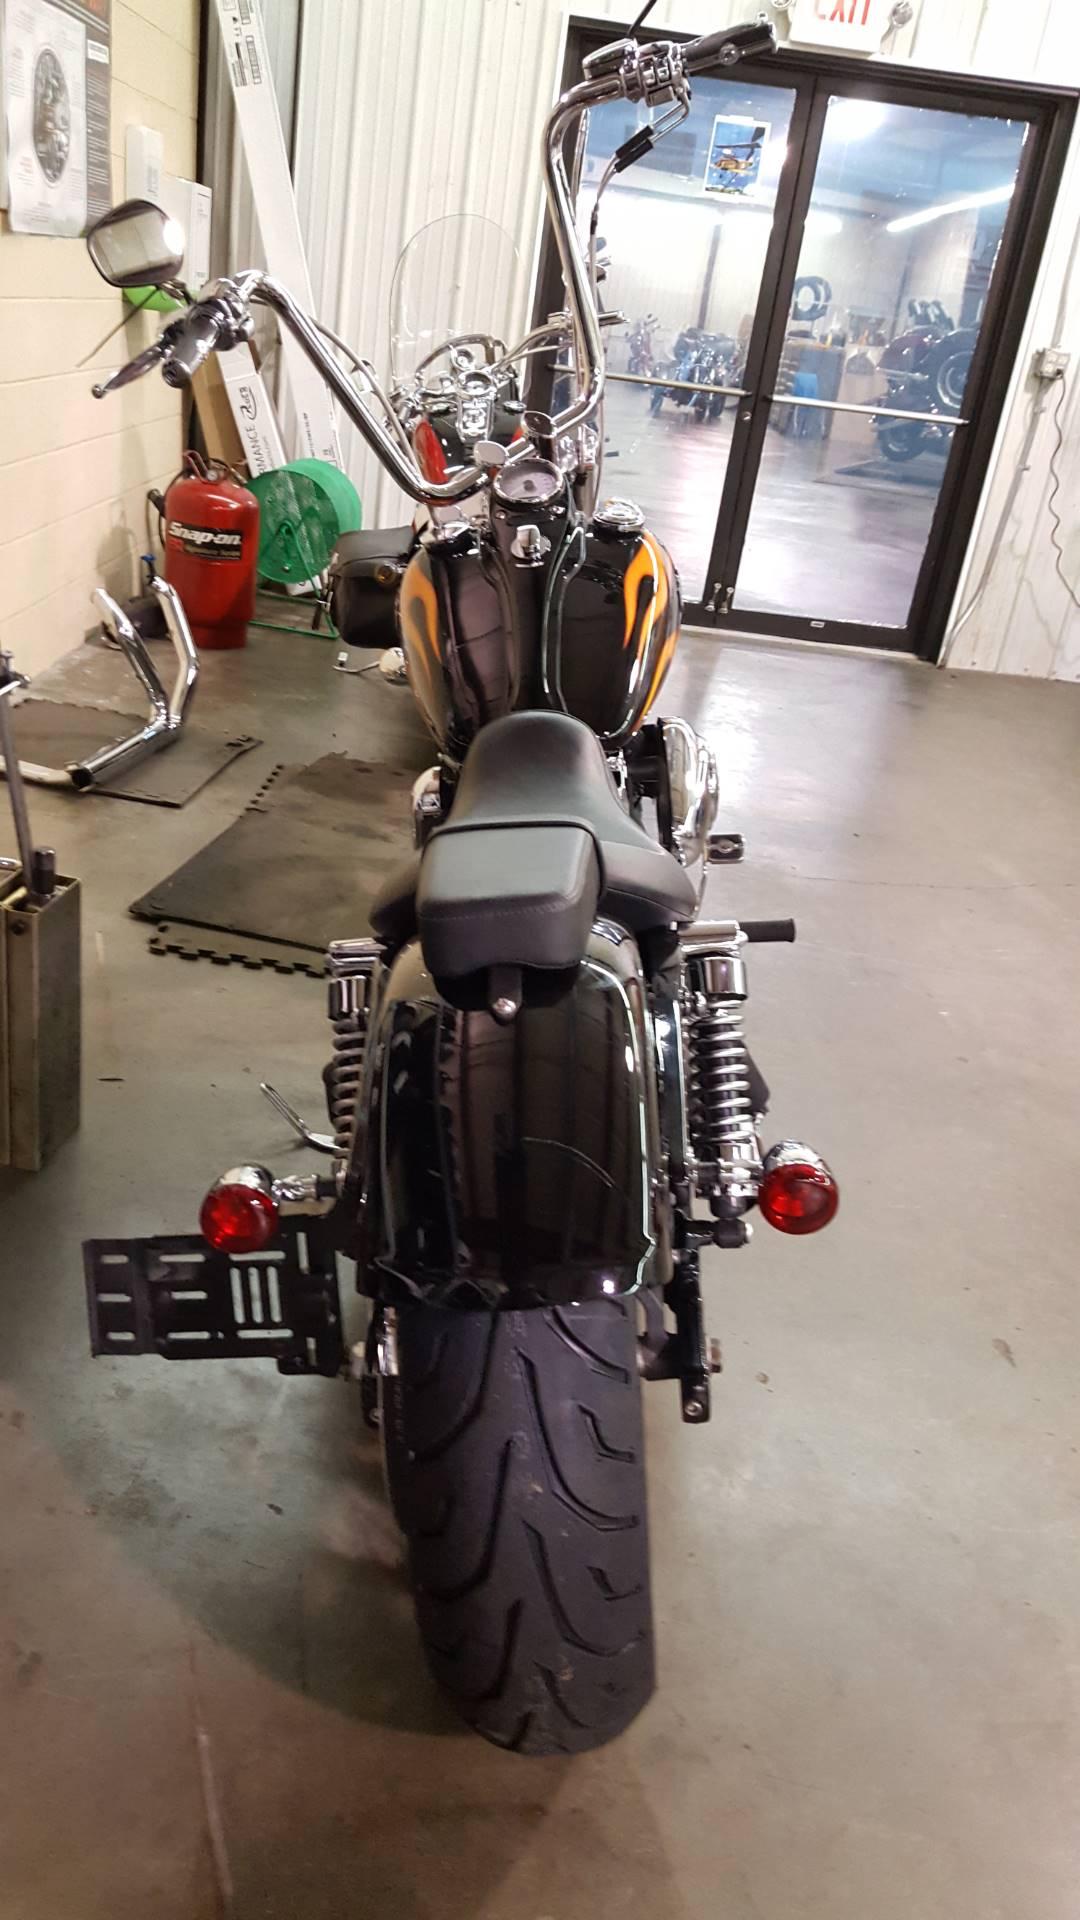 2011 Harley-Davidson Dyna® Wide Glide® in Hico, West Virginia